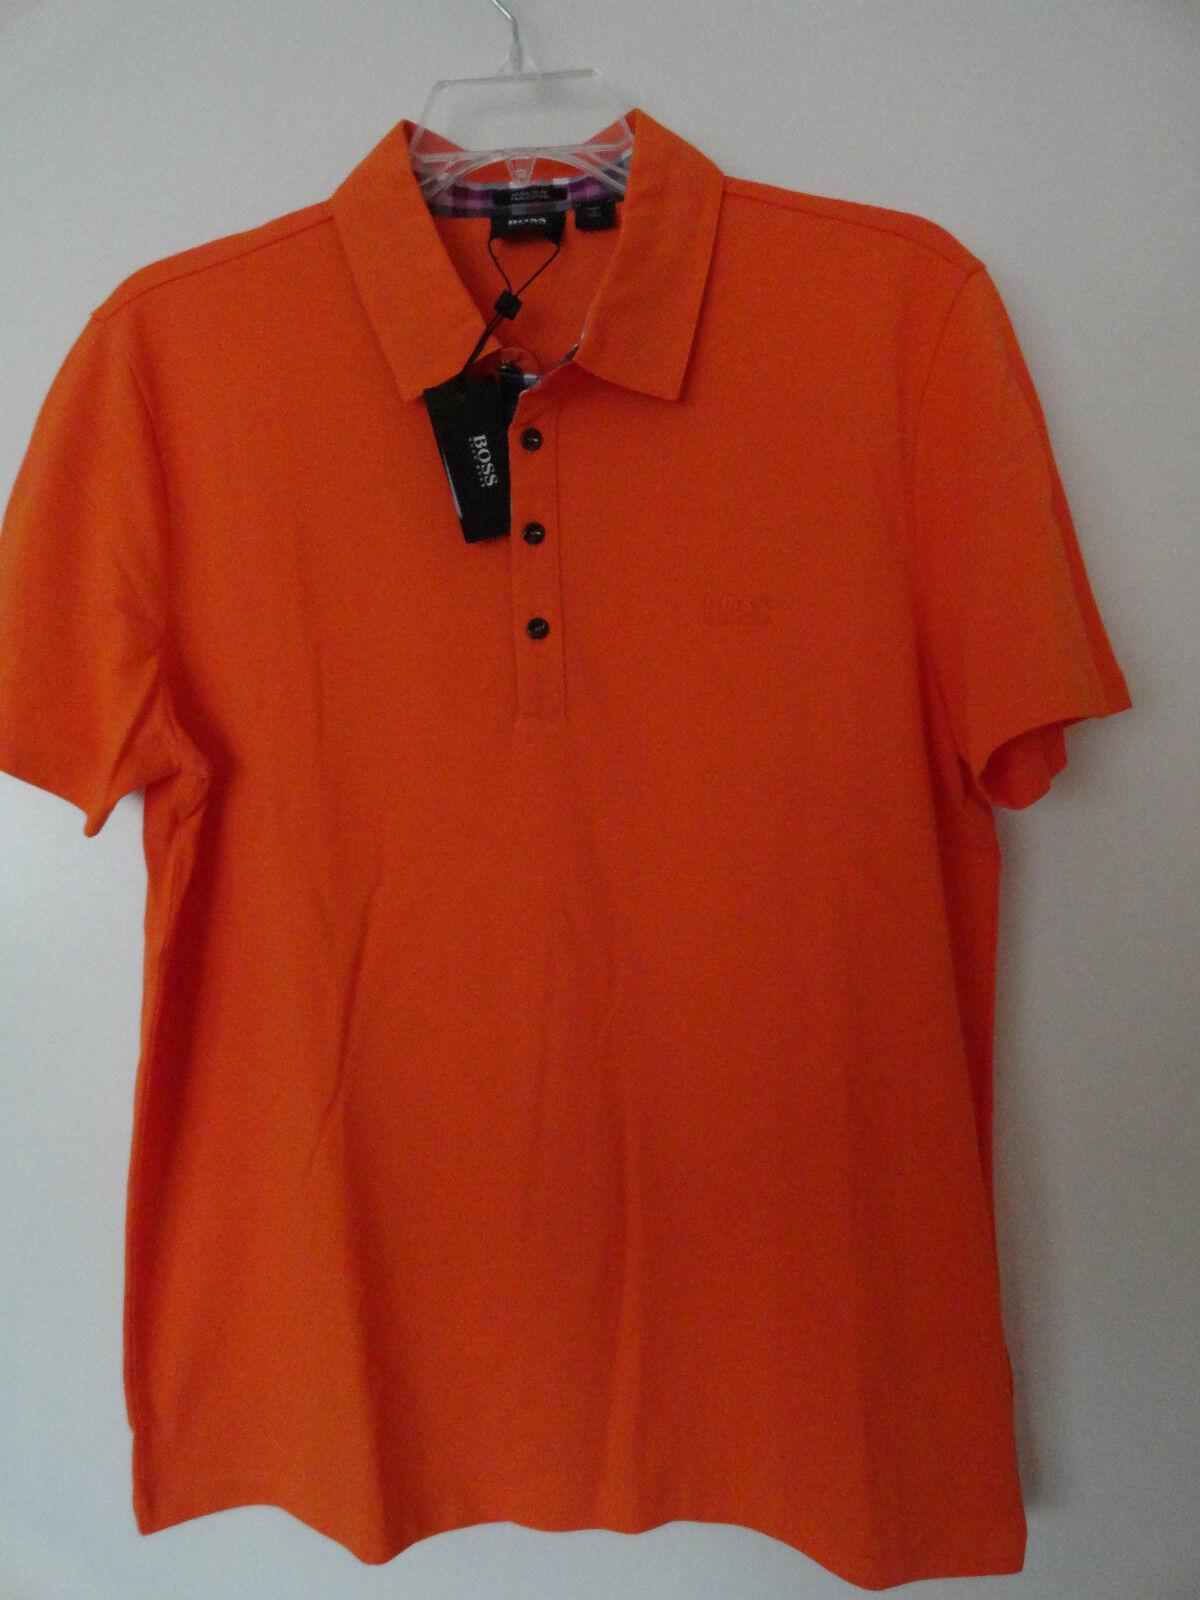 NWT HUGO BOSS  FIRENZE 27  MEN'S LOGO POLO SHIRT COTTON BRIGHT orange